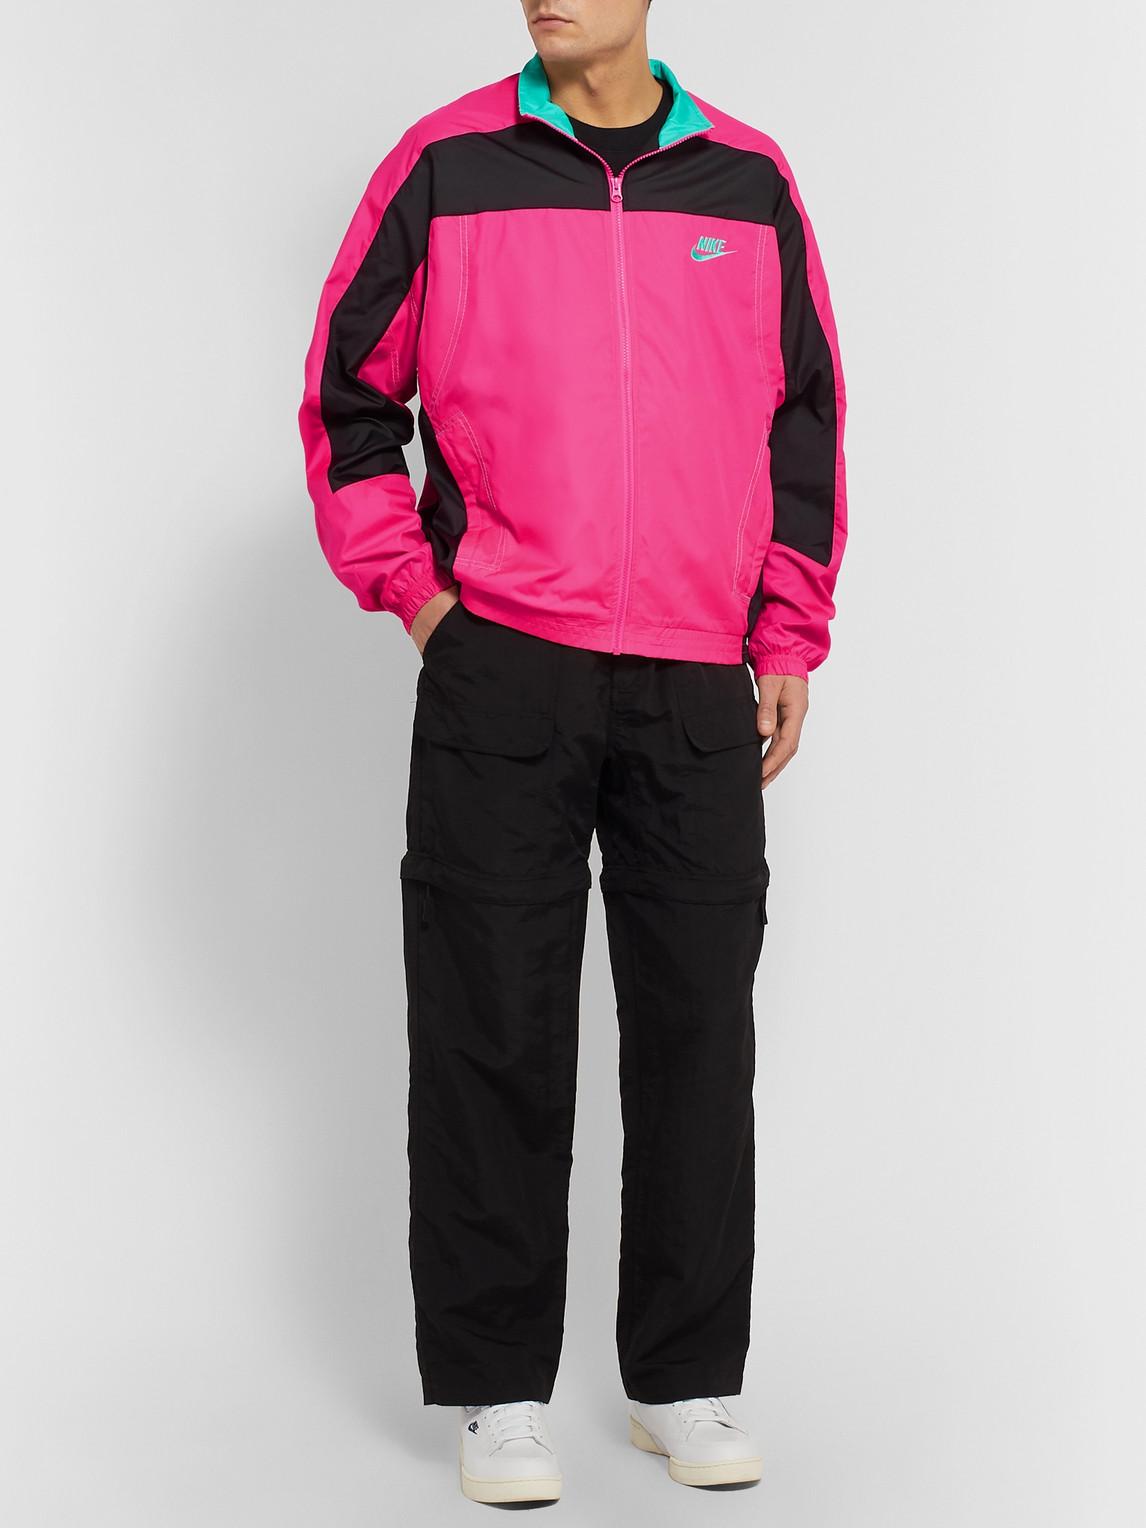 Nike Jackets ATMOS SHELL TRACK JACKET